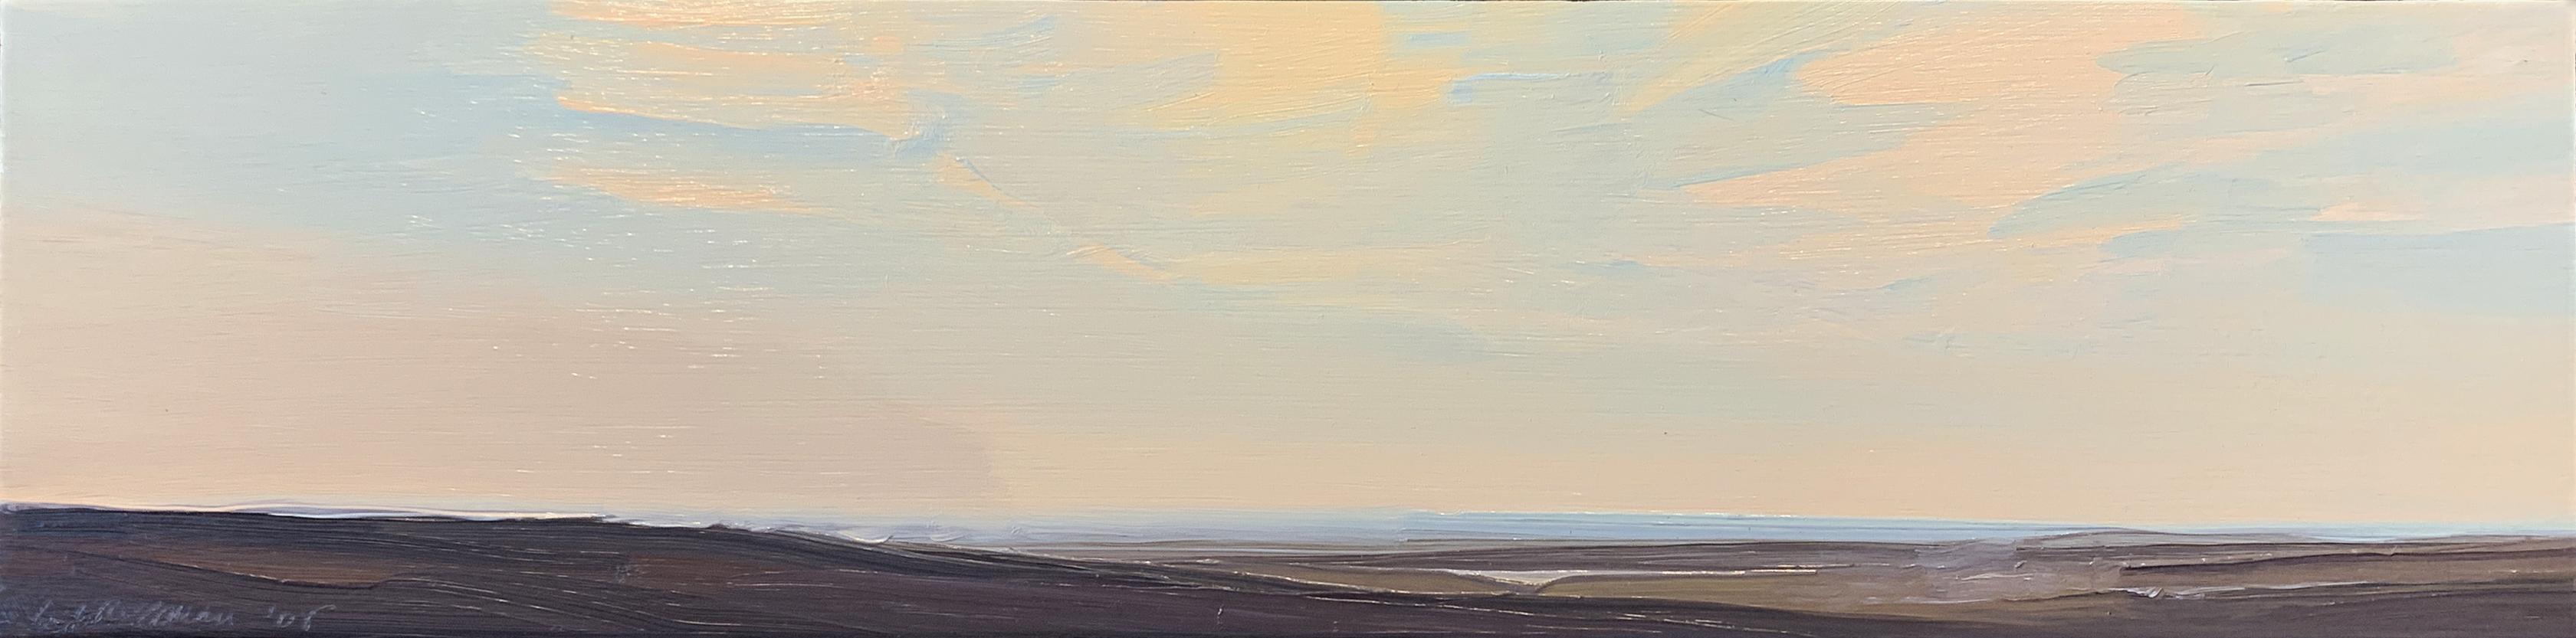 Burning Along Sharpes... by  Lisa Grossman - Masterpiece Online